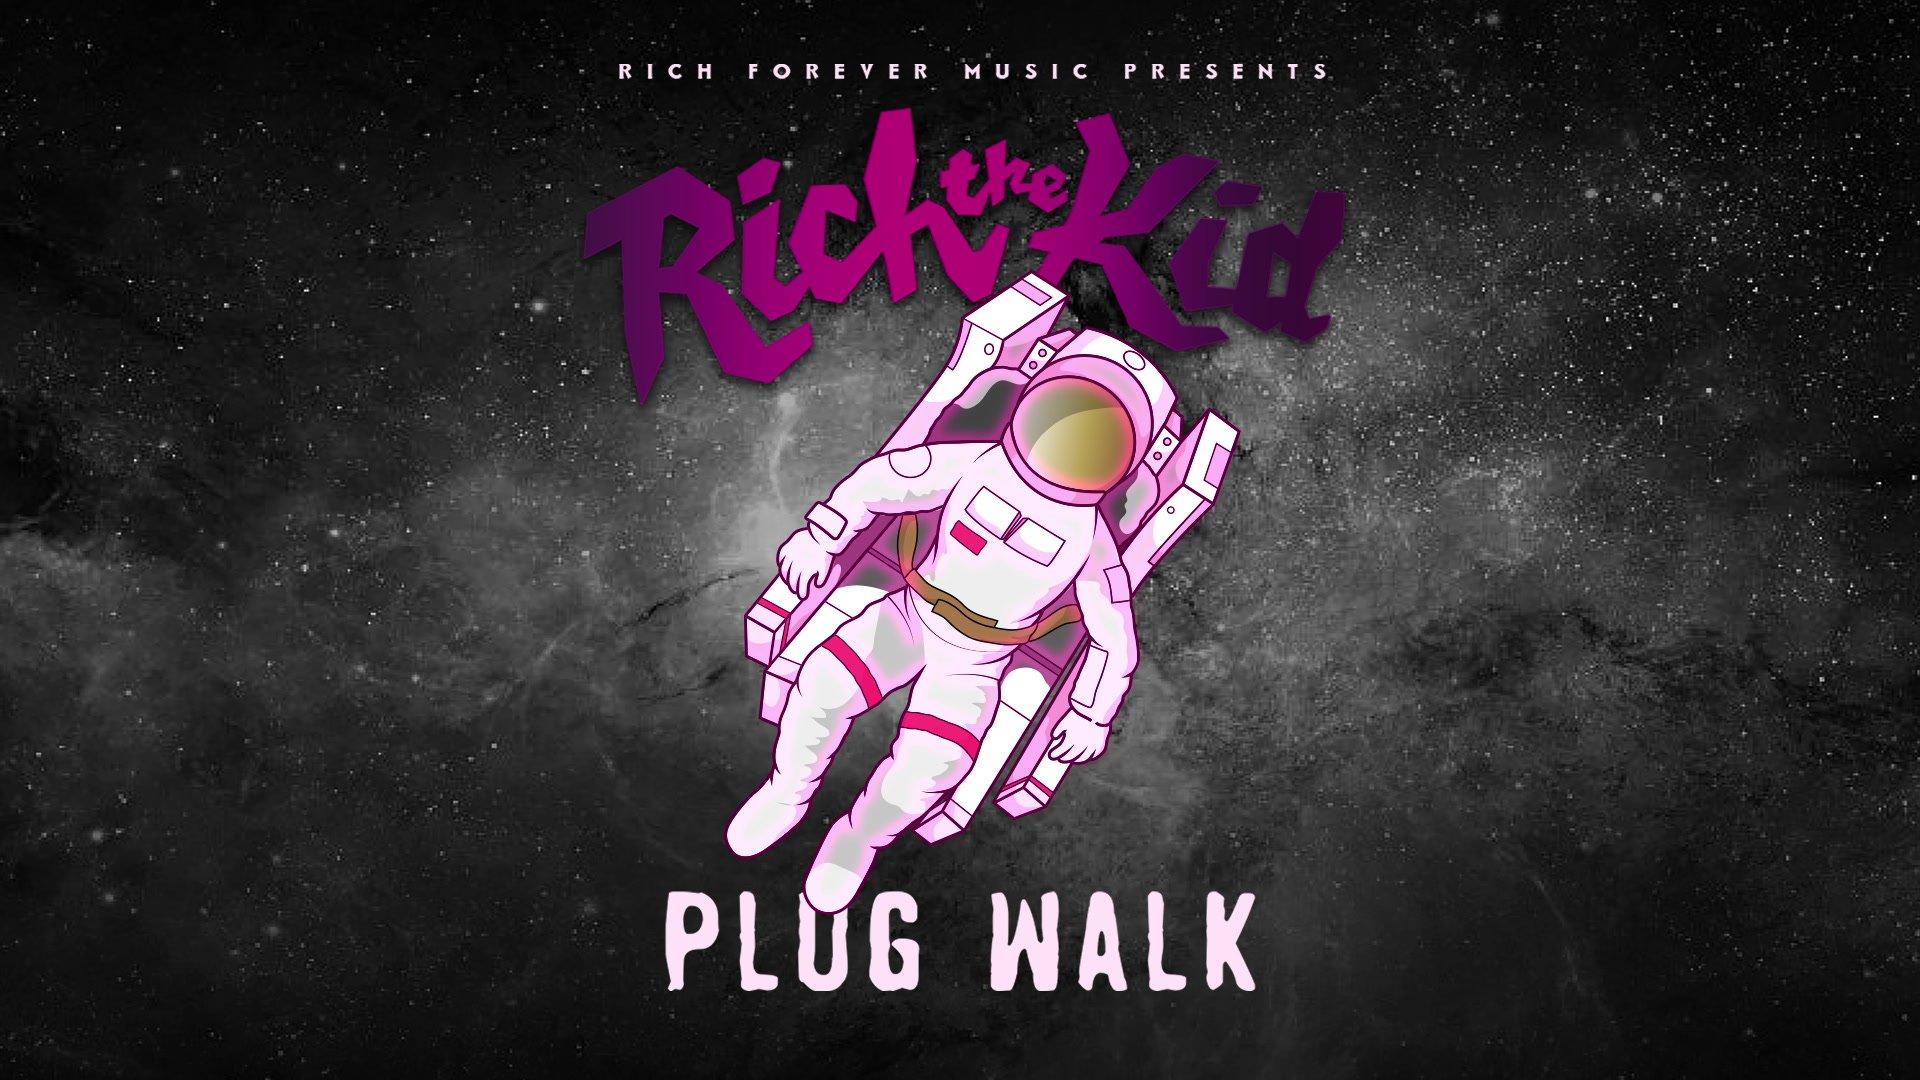 Rich The Kid - Plug Walk (Audio) - YouTube